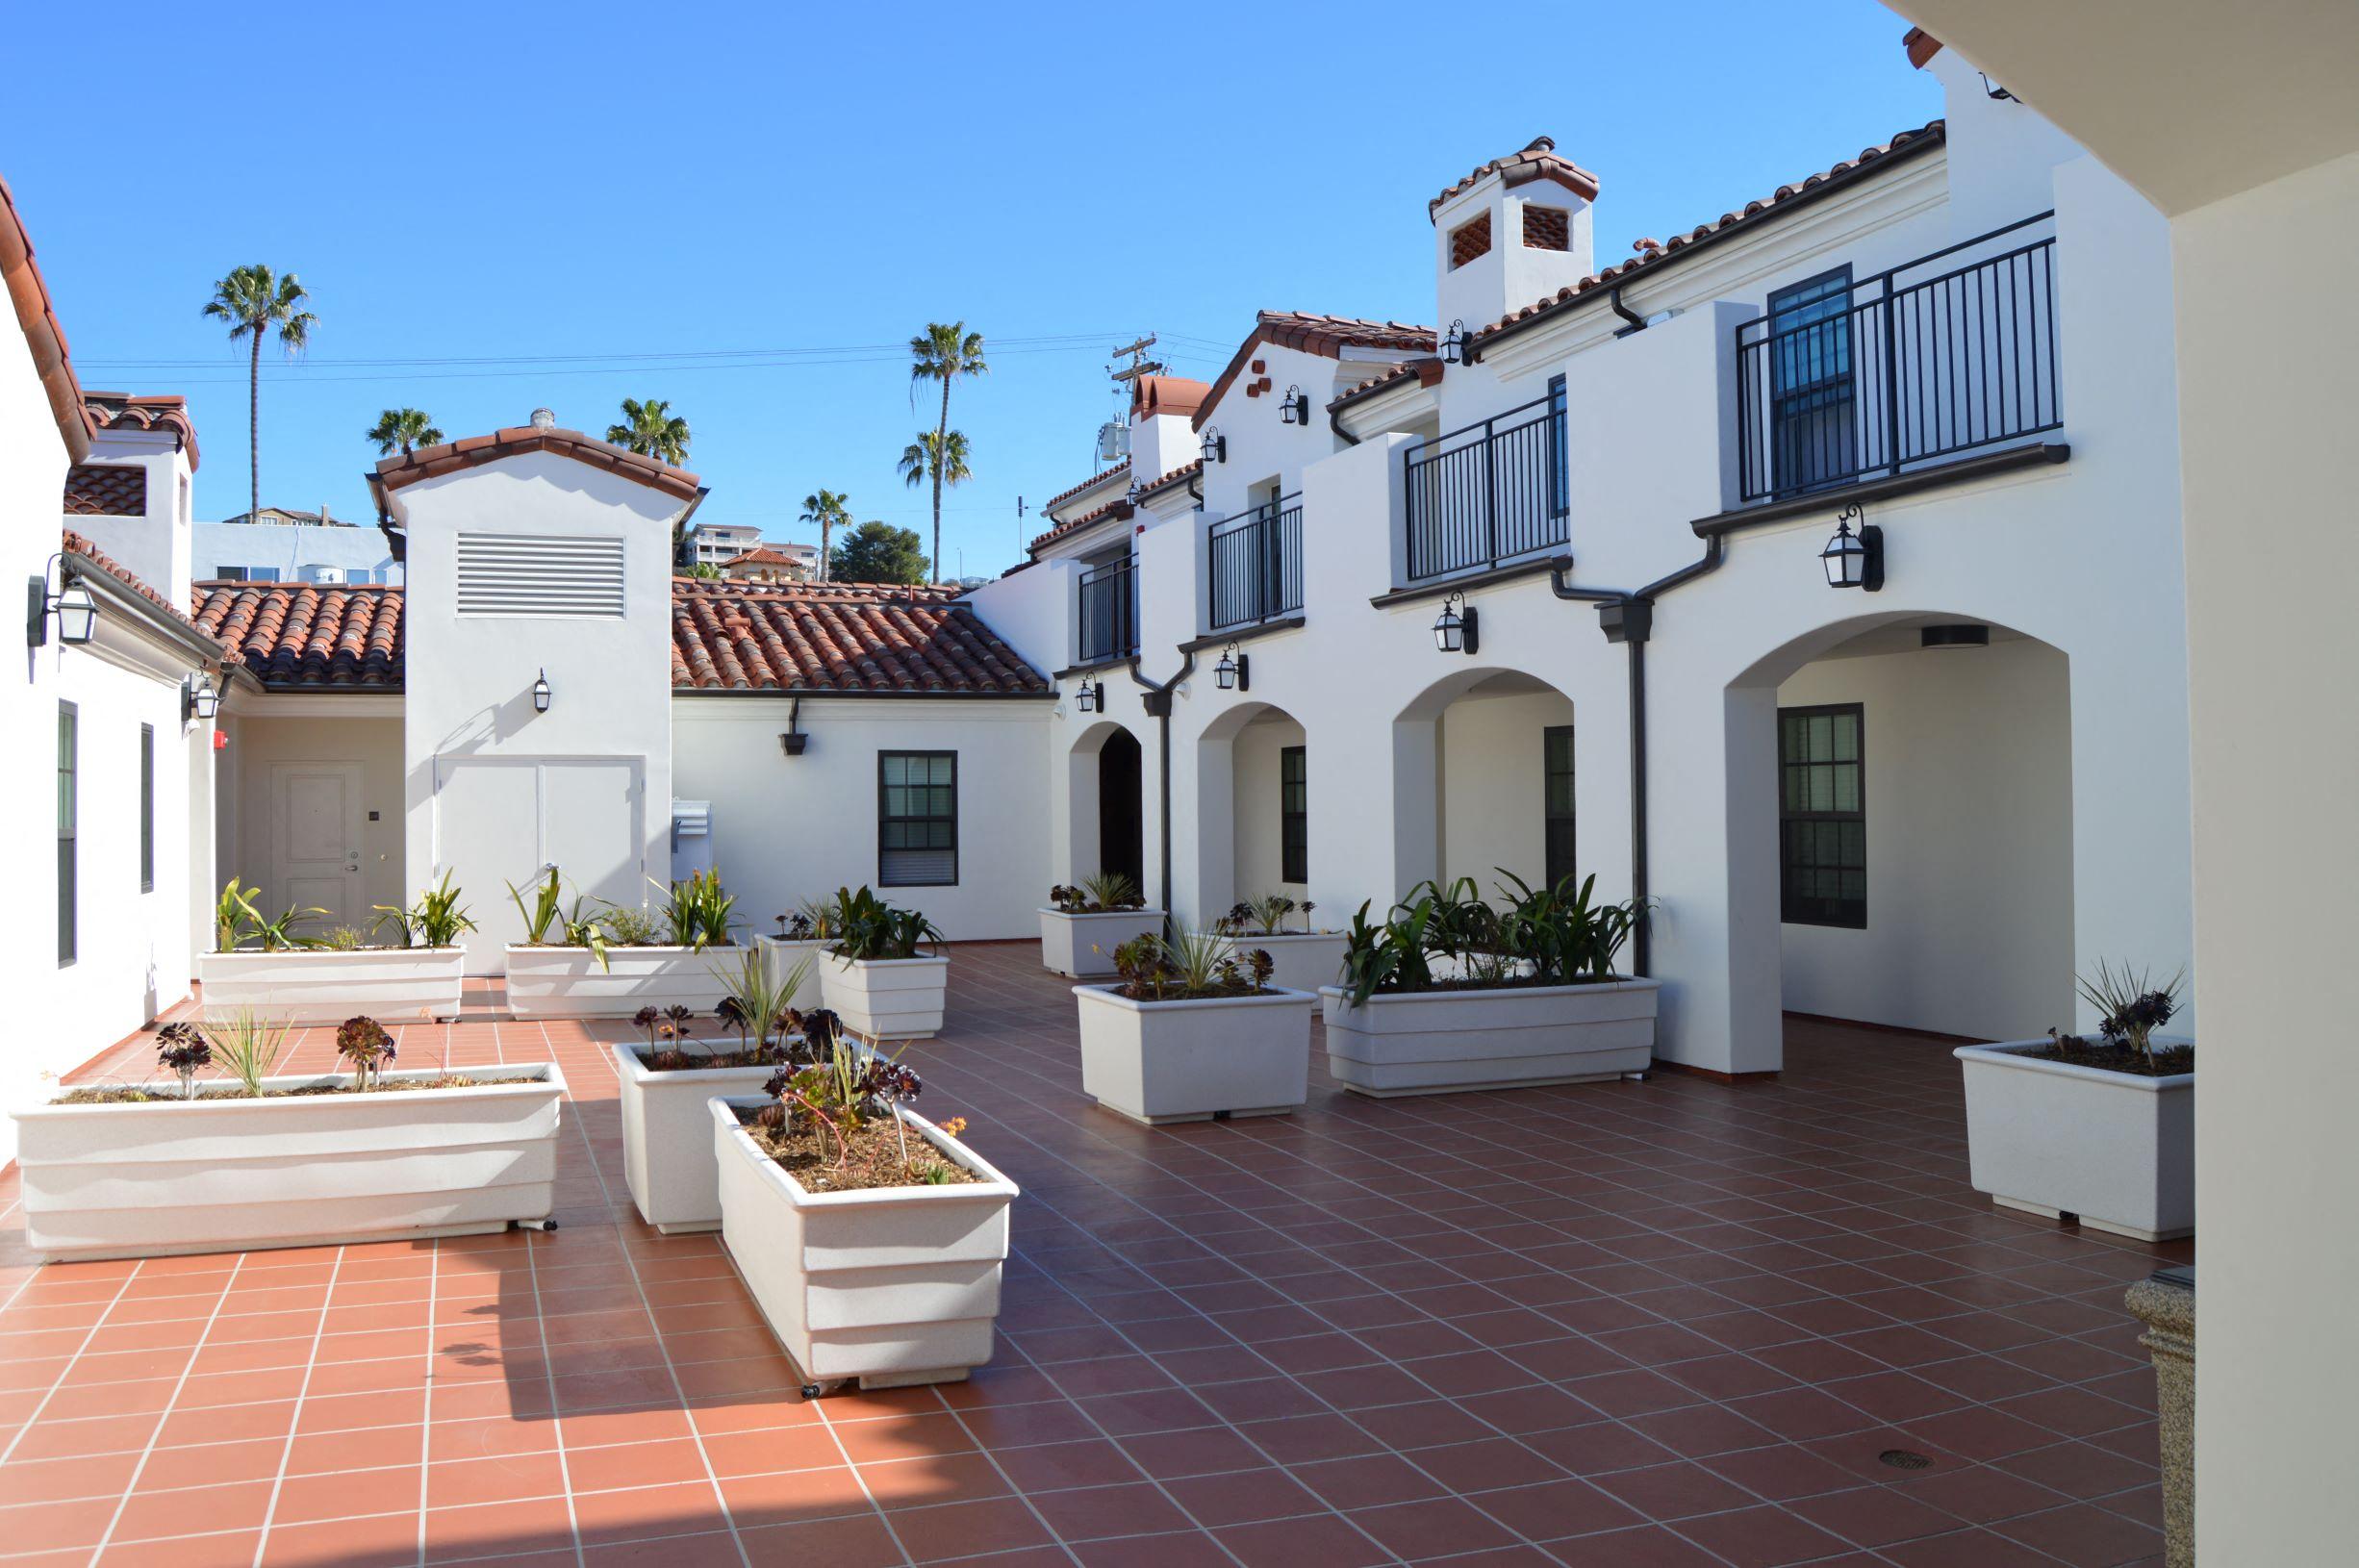 Las Palmas Village Courtyard